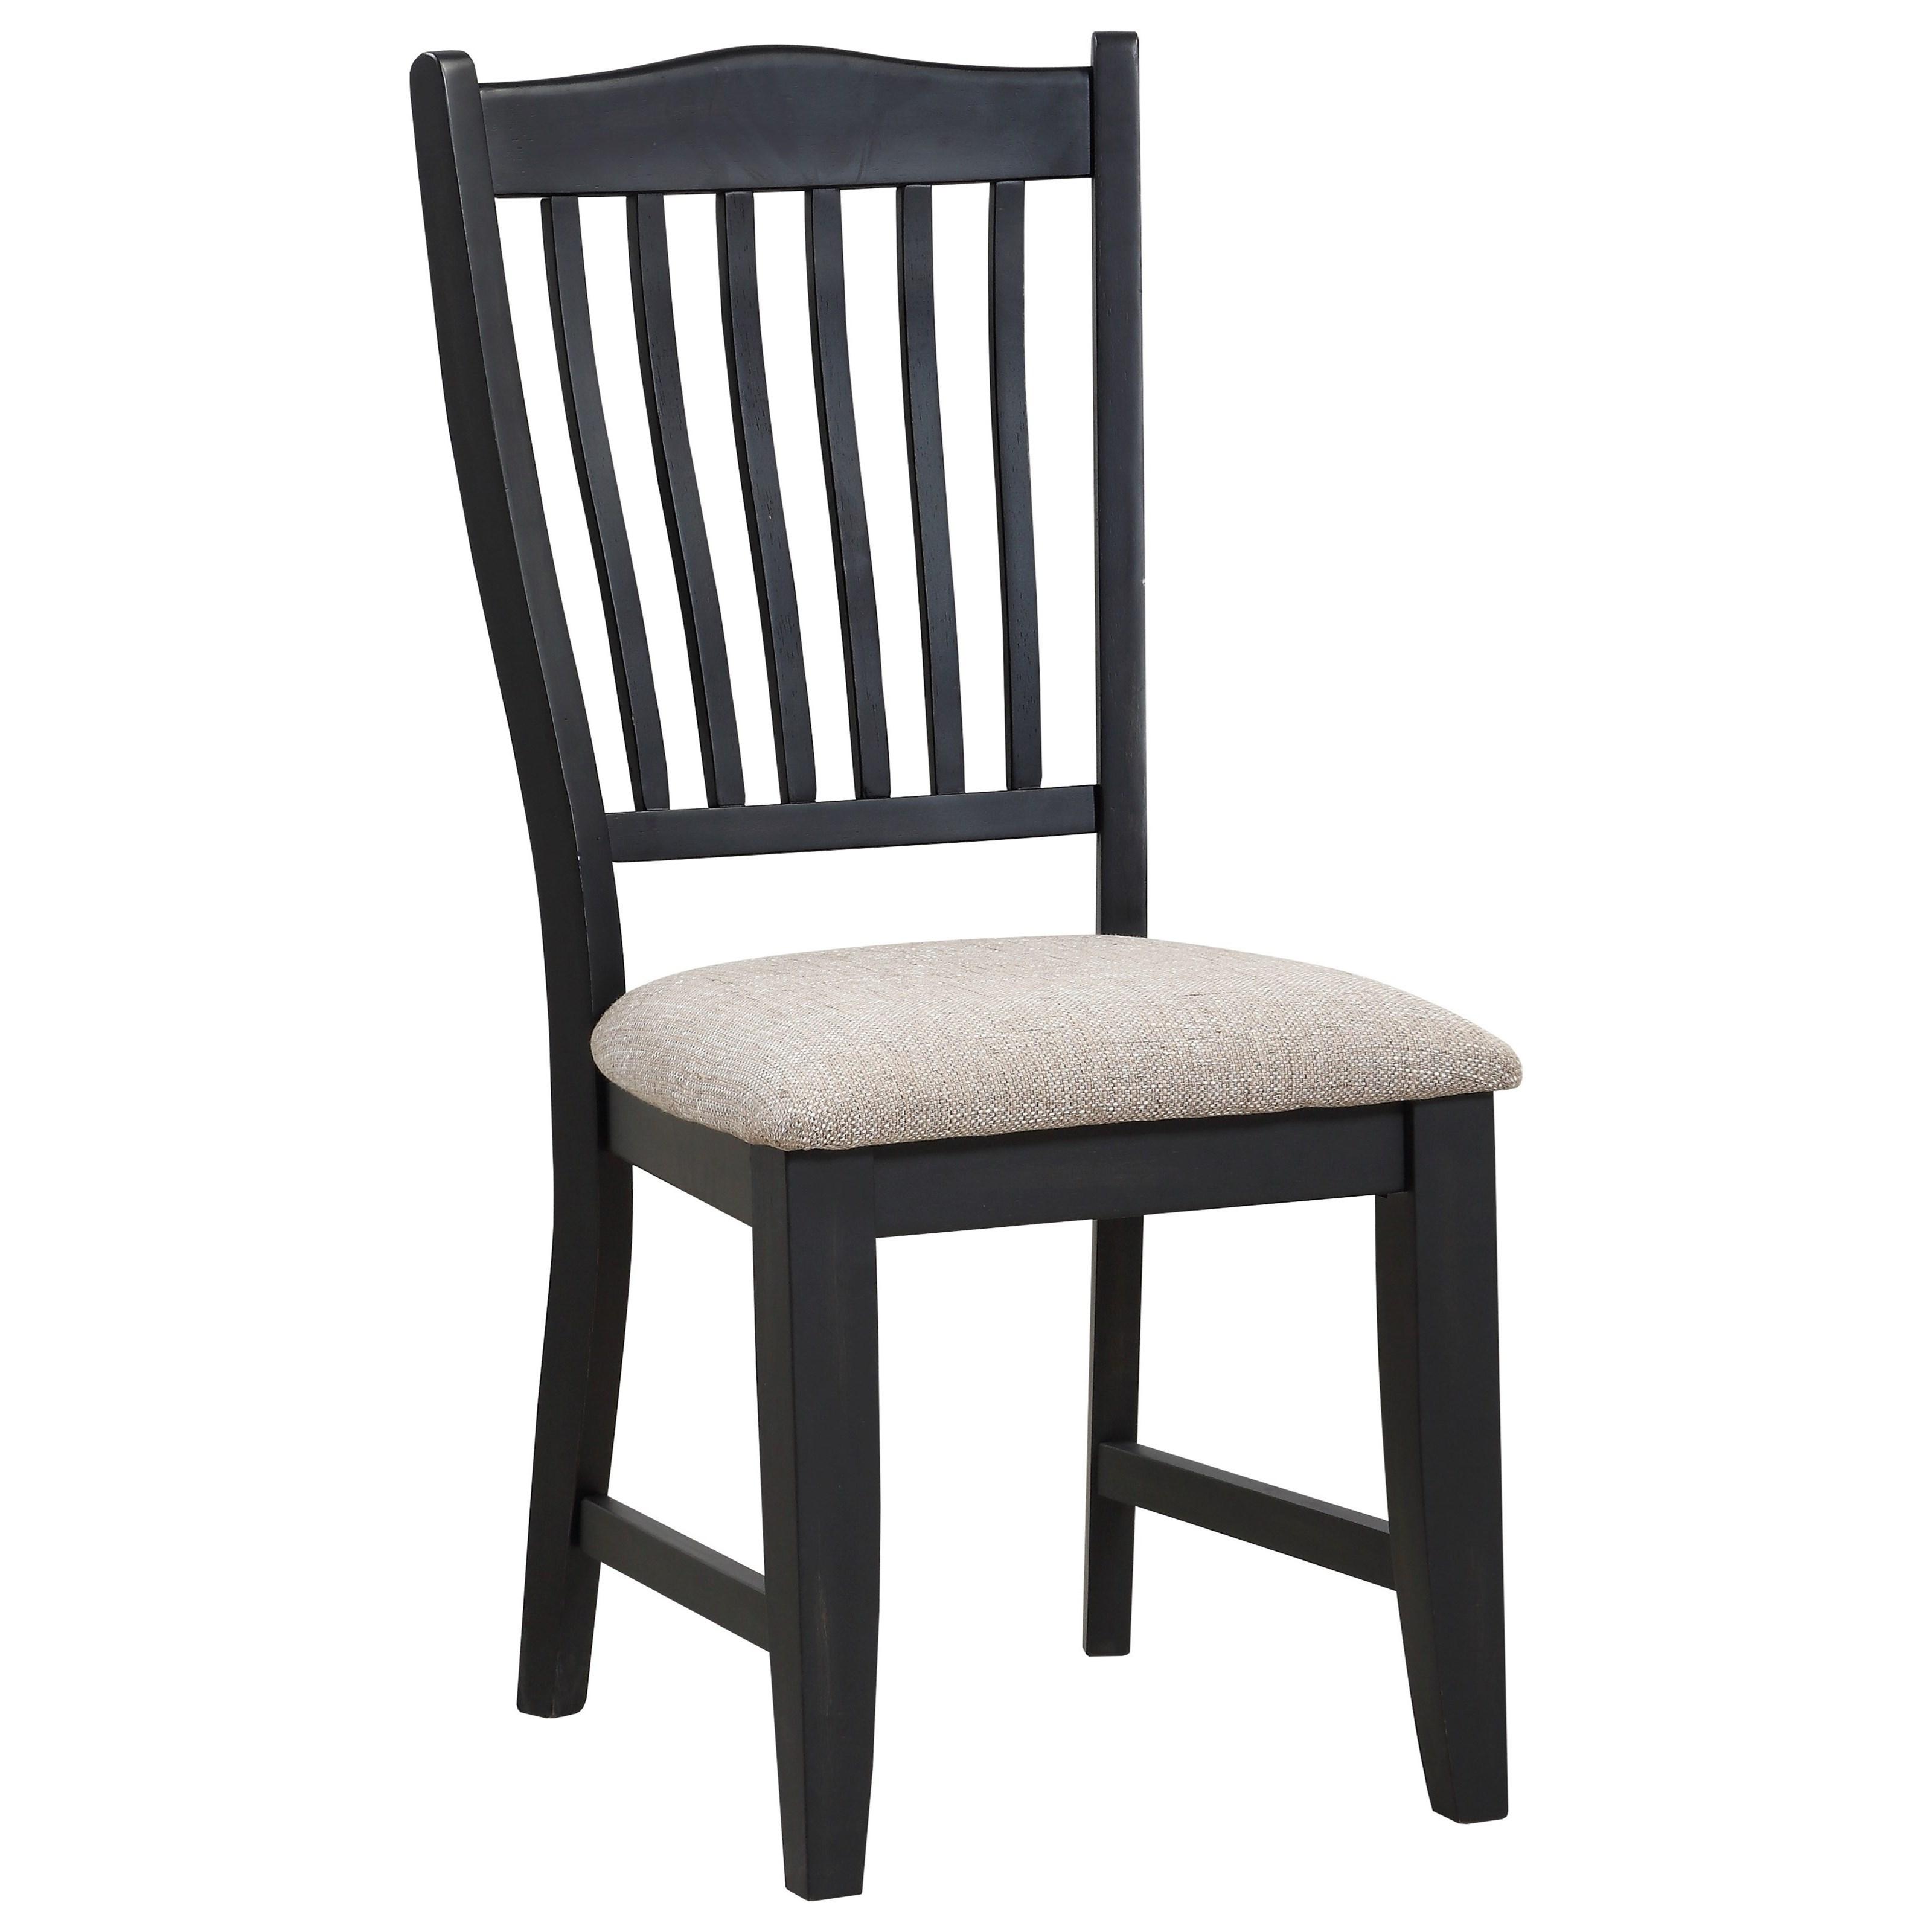 Buchanan Dining Chair at Sadler's Home Furnishings